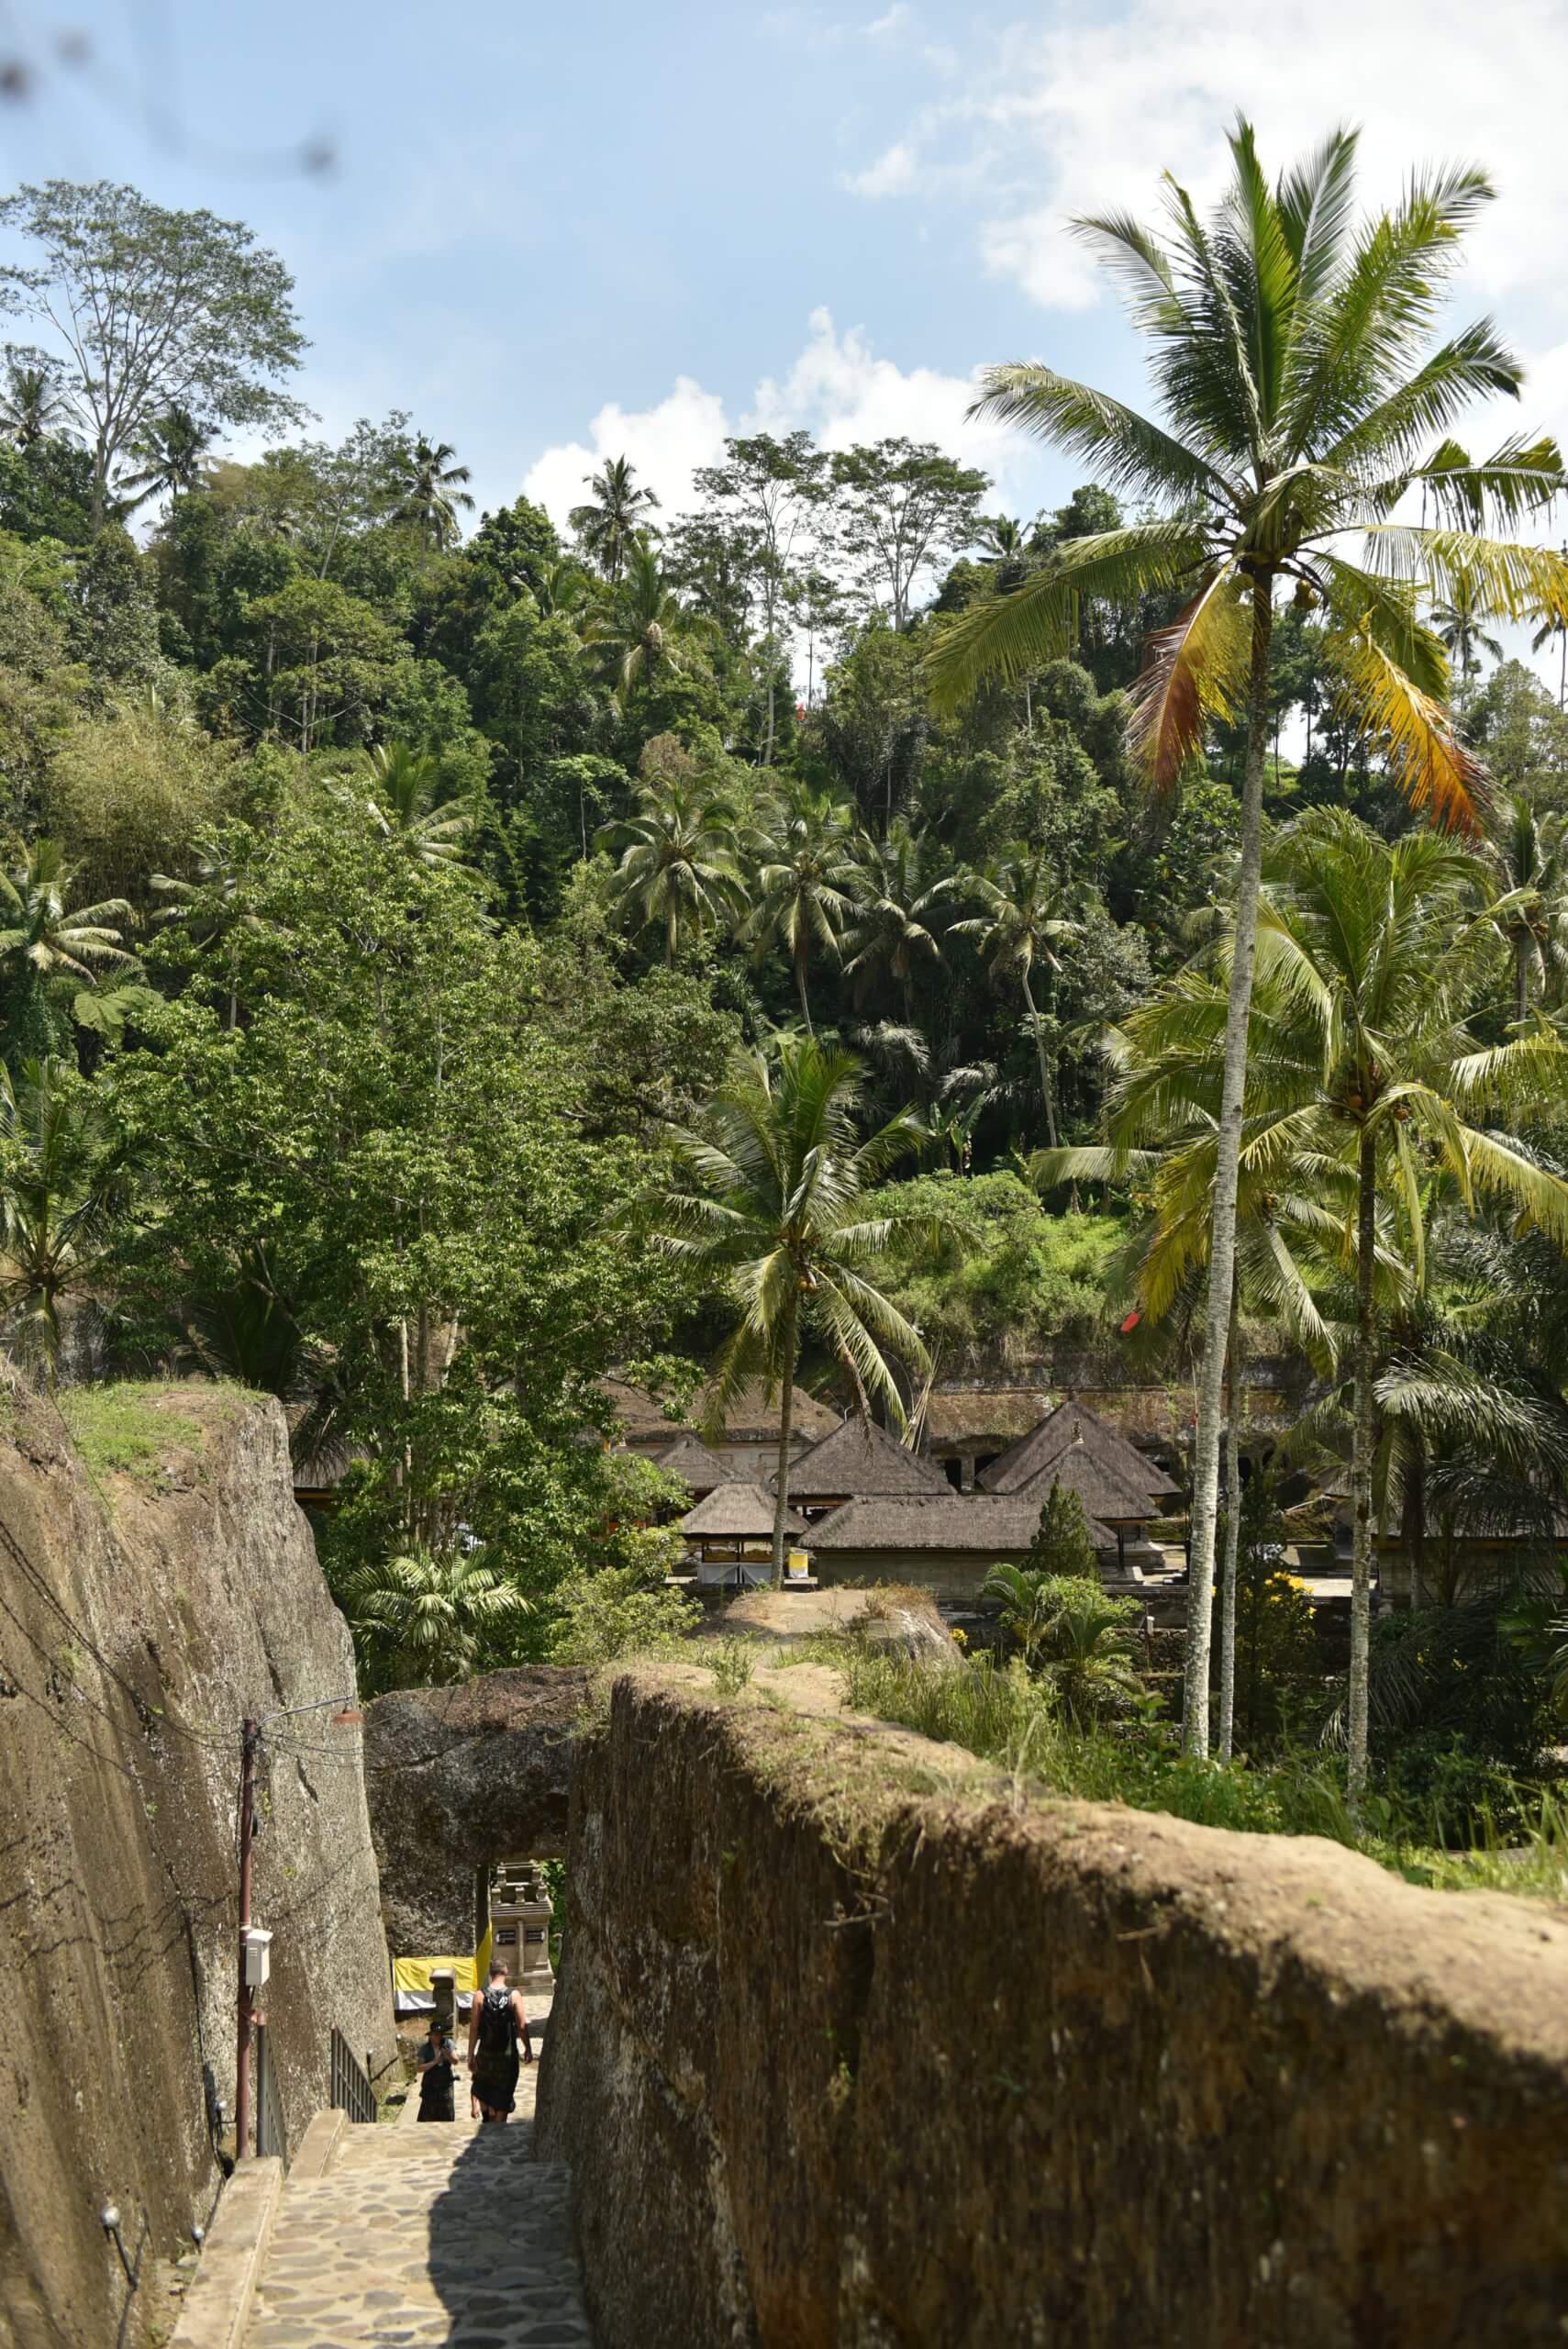 Chemin menant au temple gunung kawi